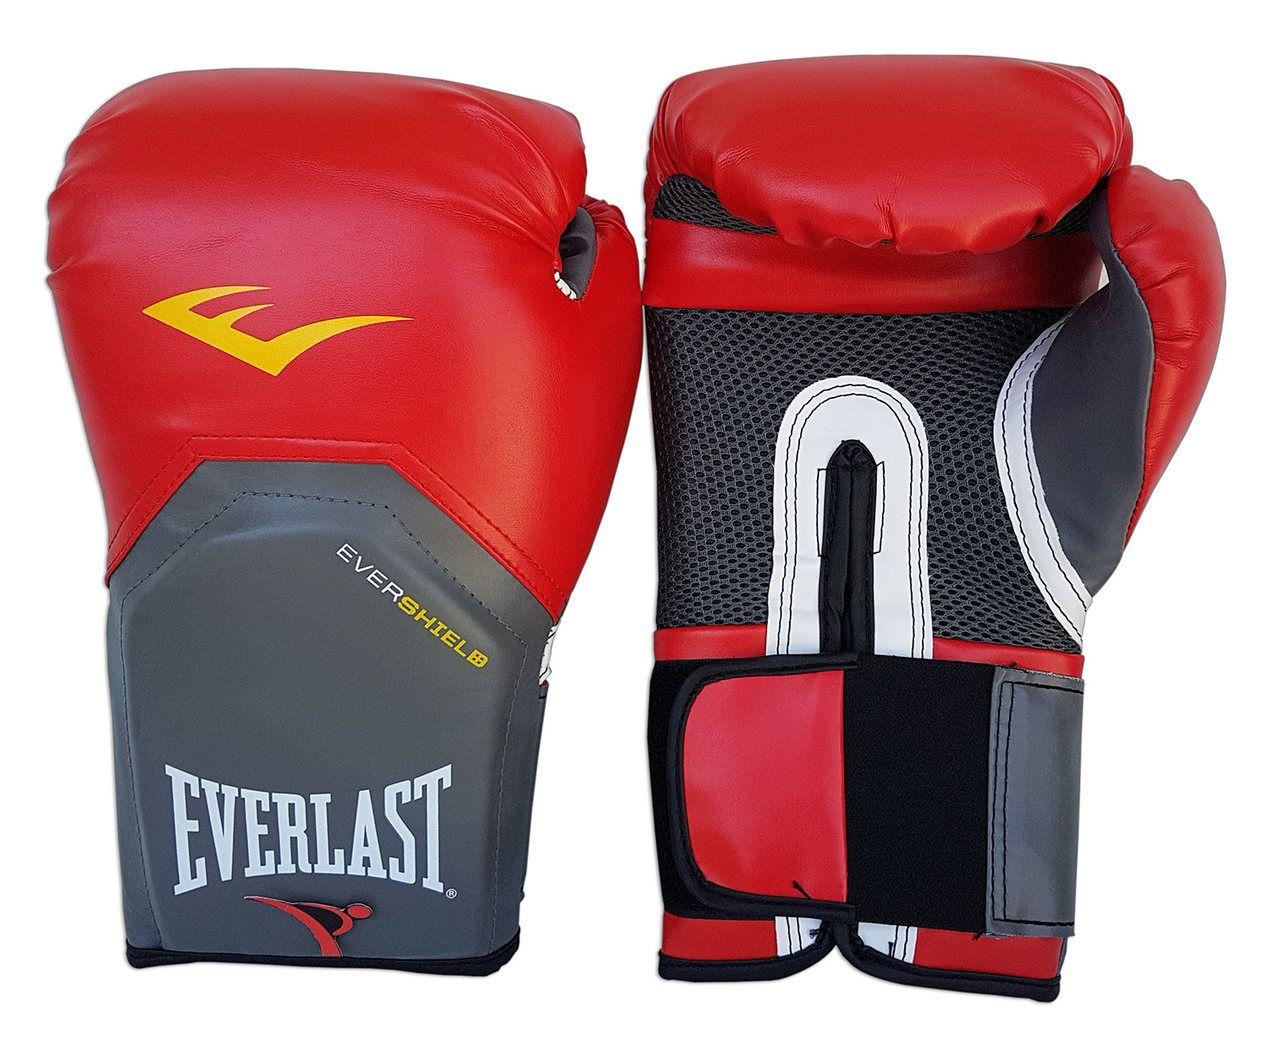 Luva de Boxe / Muay Thai 14oz - Vermelho - Pro Style - Everlast  - PRALUTA SHOP